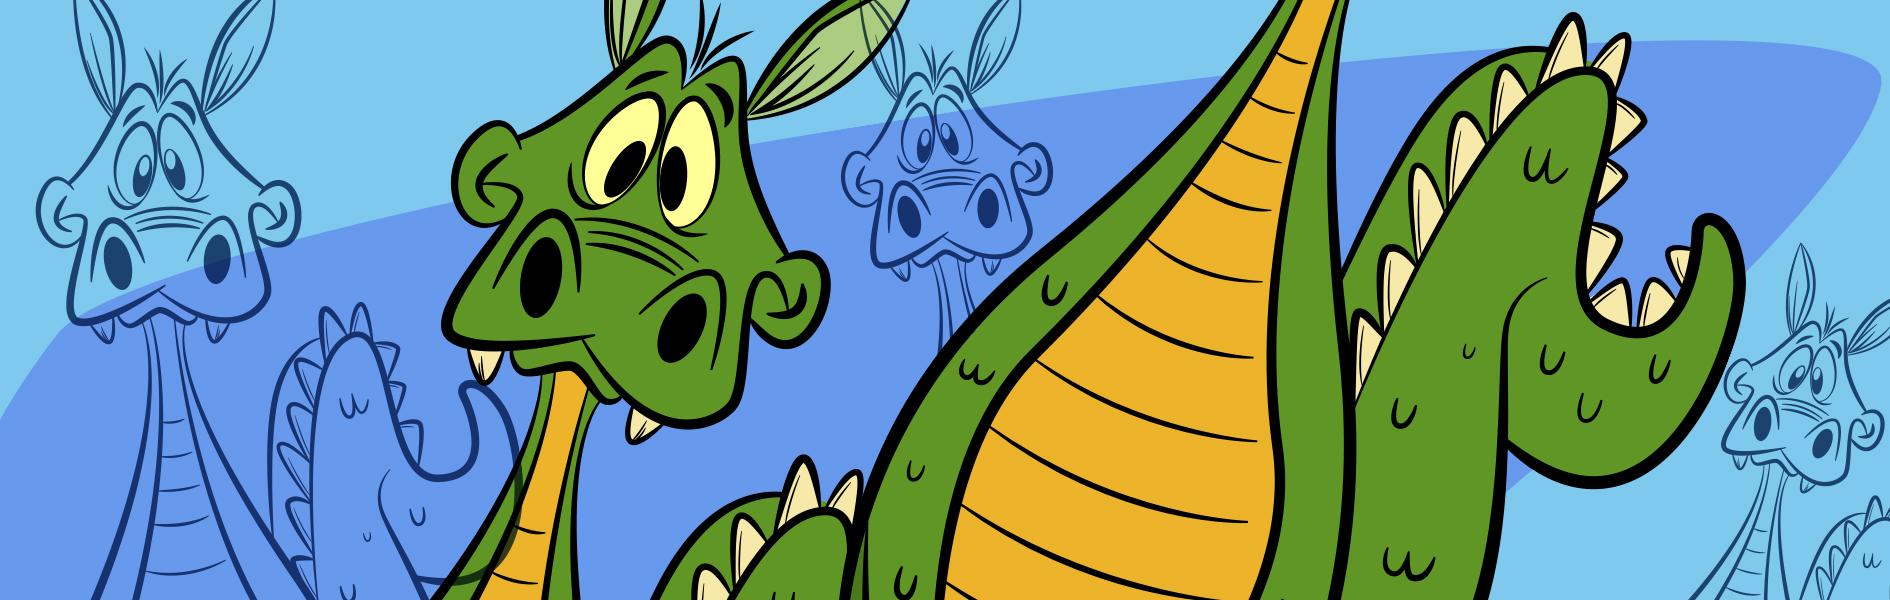 Banner-Dragon.jpg